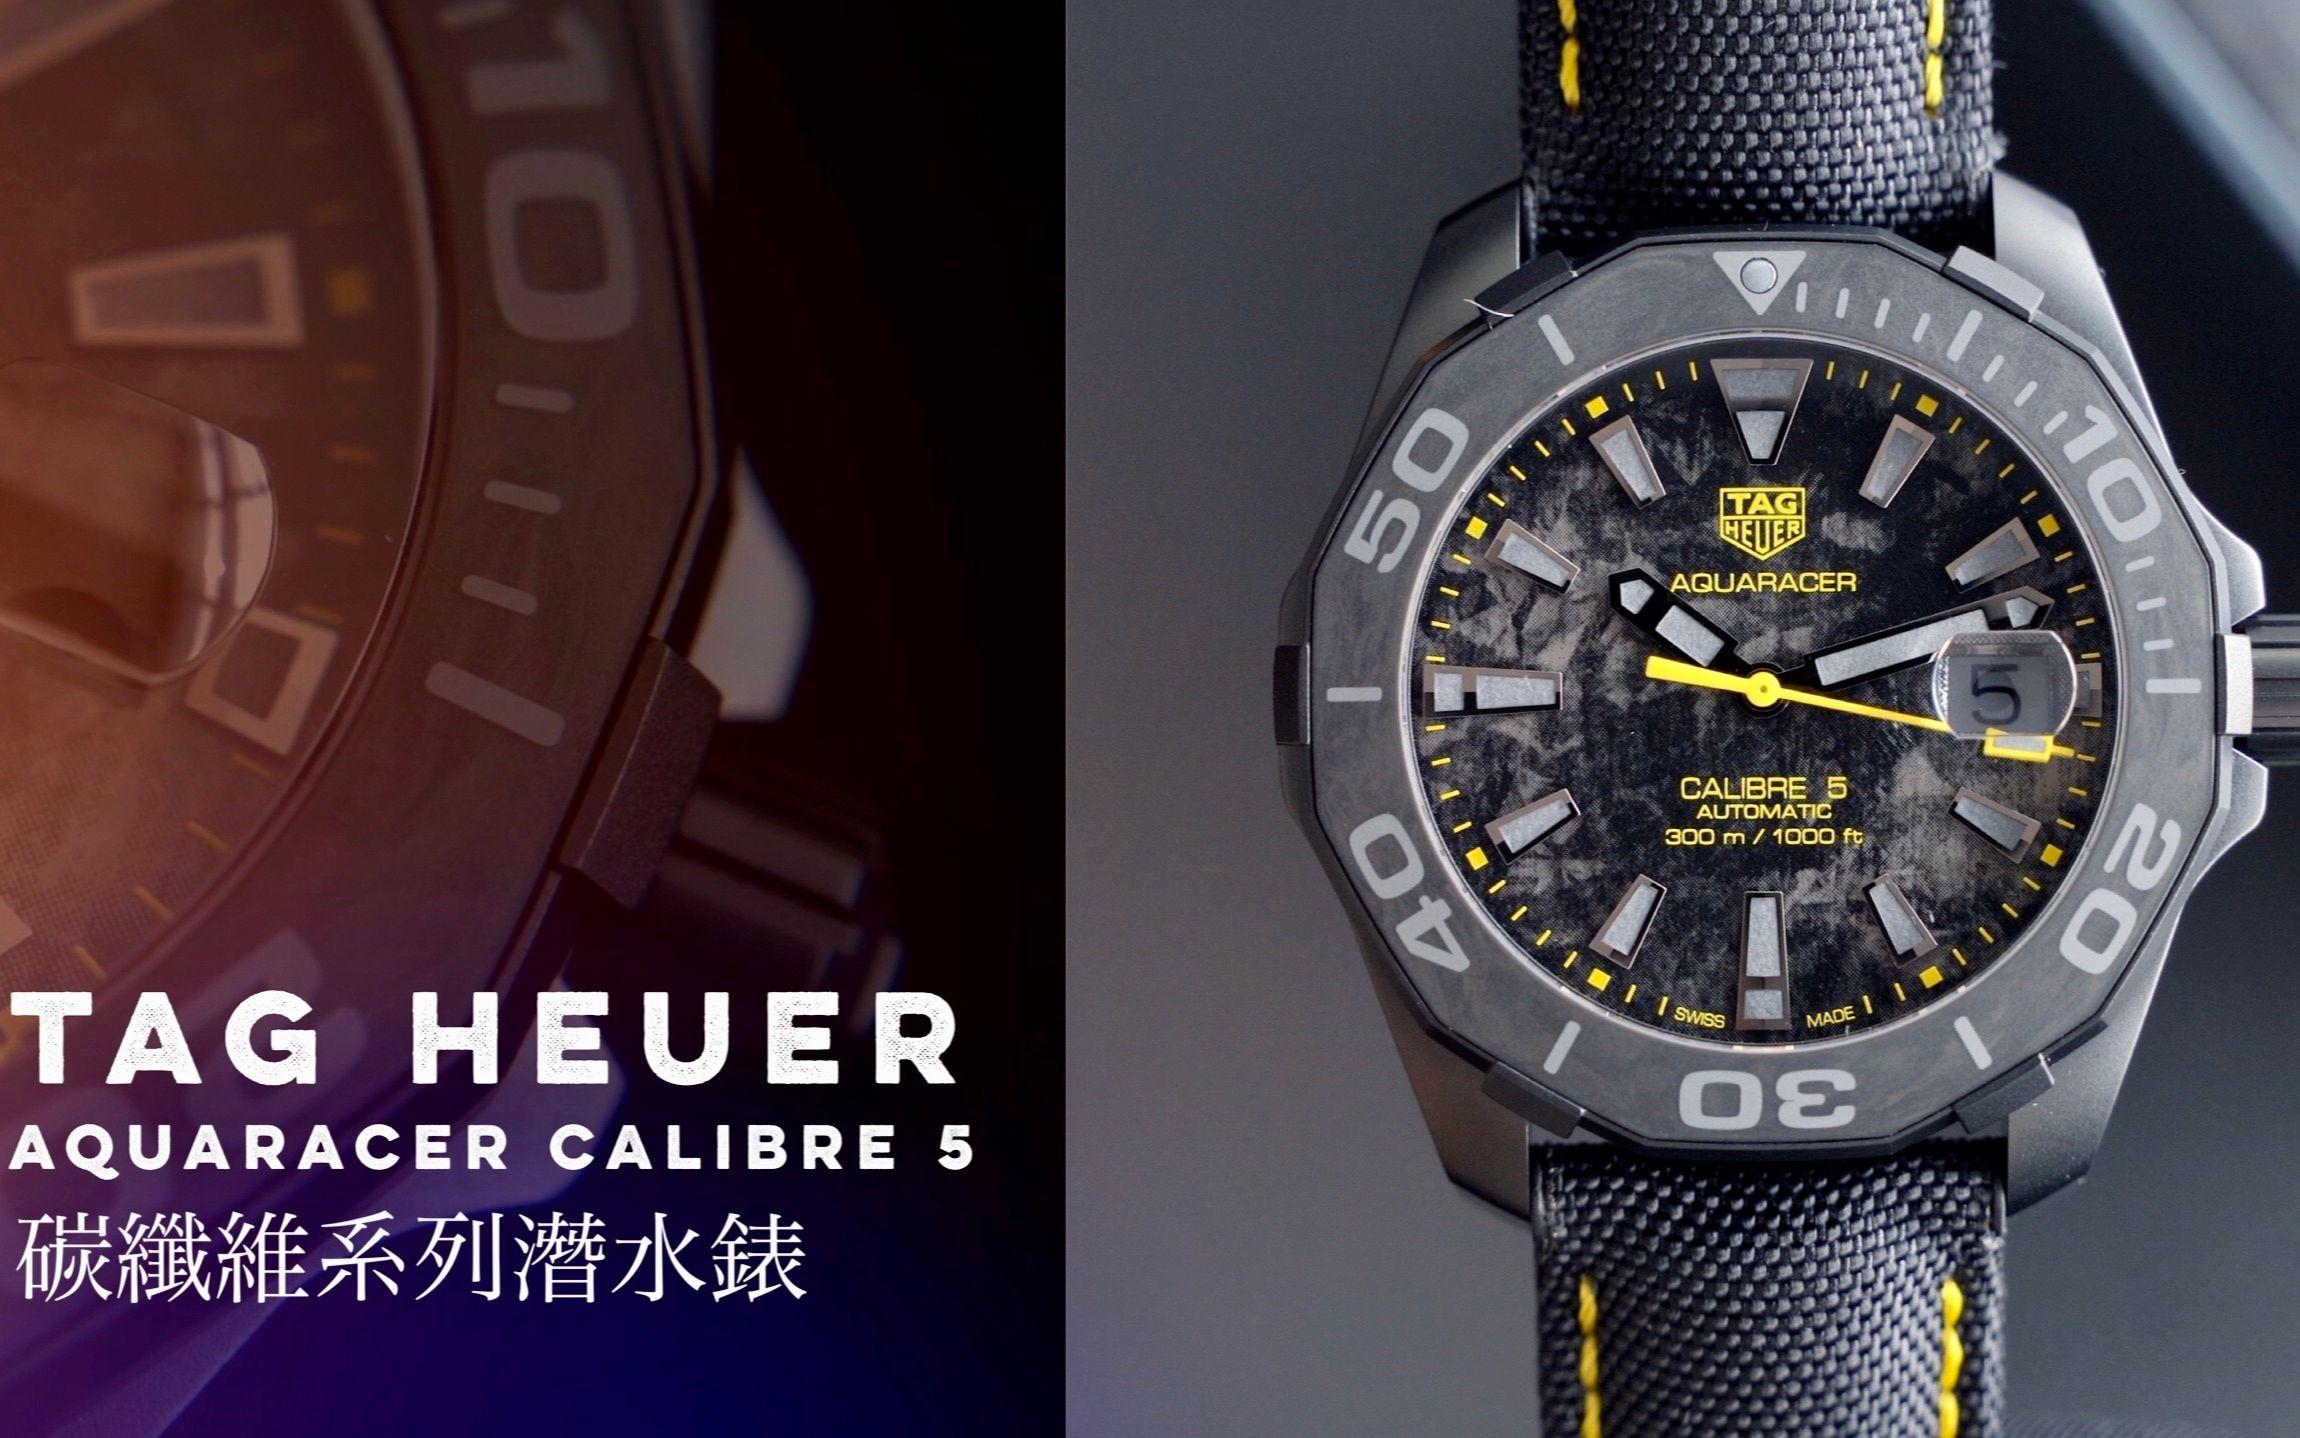 [QUICKLOOK]泰格豪雅TAG HEUER碳纖維系列AQUARACER CALIBRE 5潛水腕錶_嗶哩嗶哩 (゜-゜)つロ 干杯~-bilibili